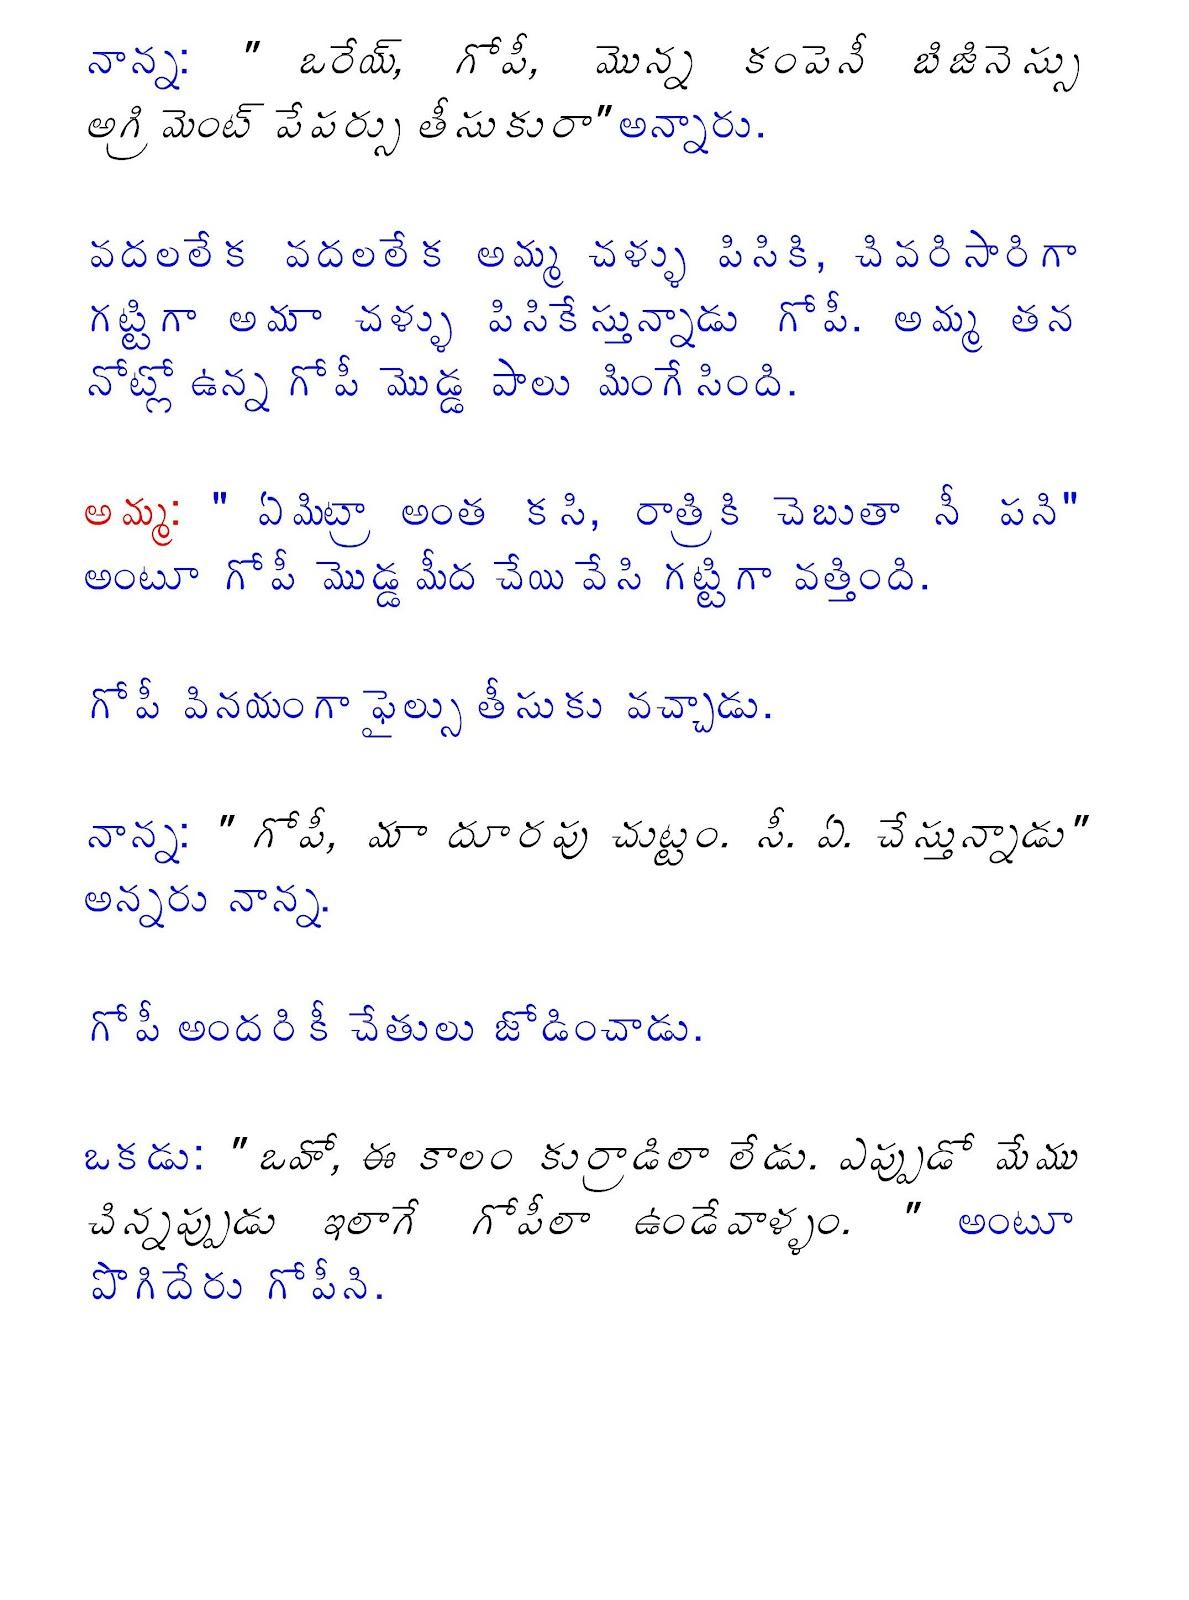 Lanjala address search